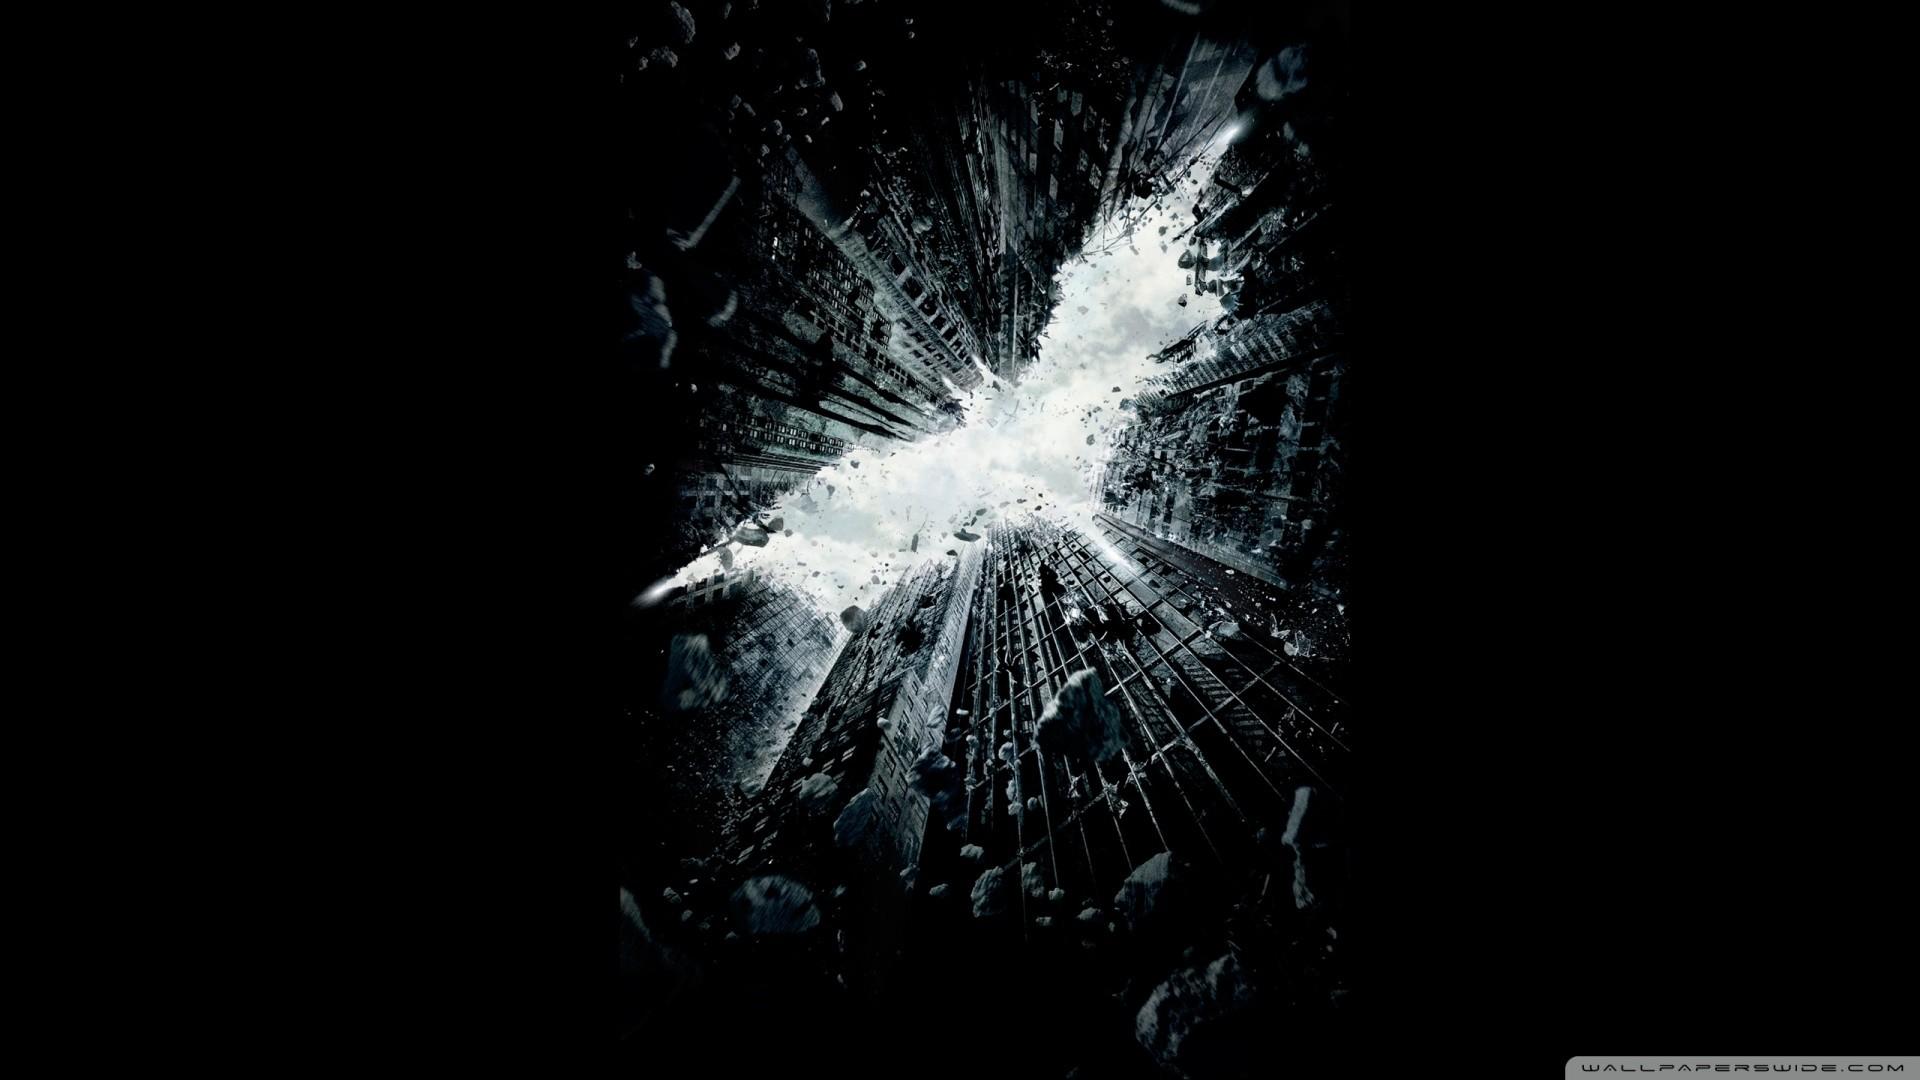 Dark Knight Rises Basic Wallpaper Dark, Knight, Rises, Basic